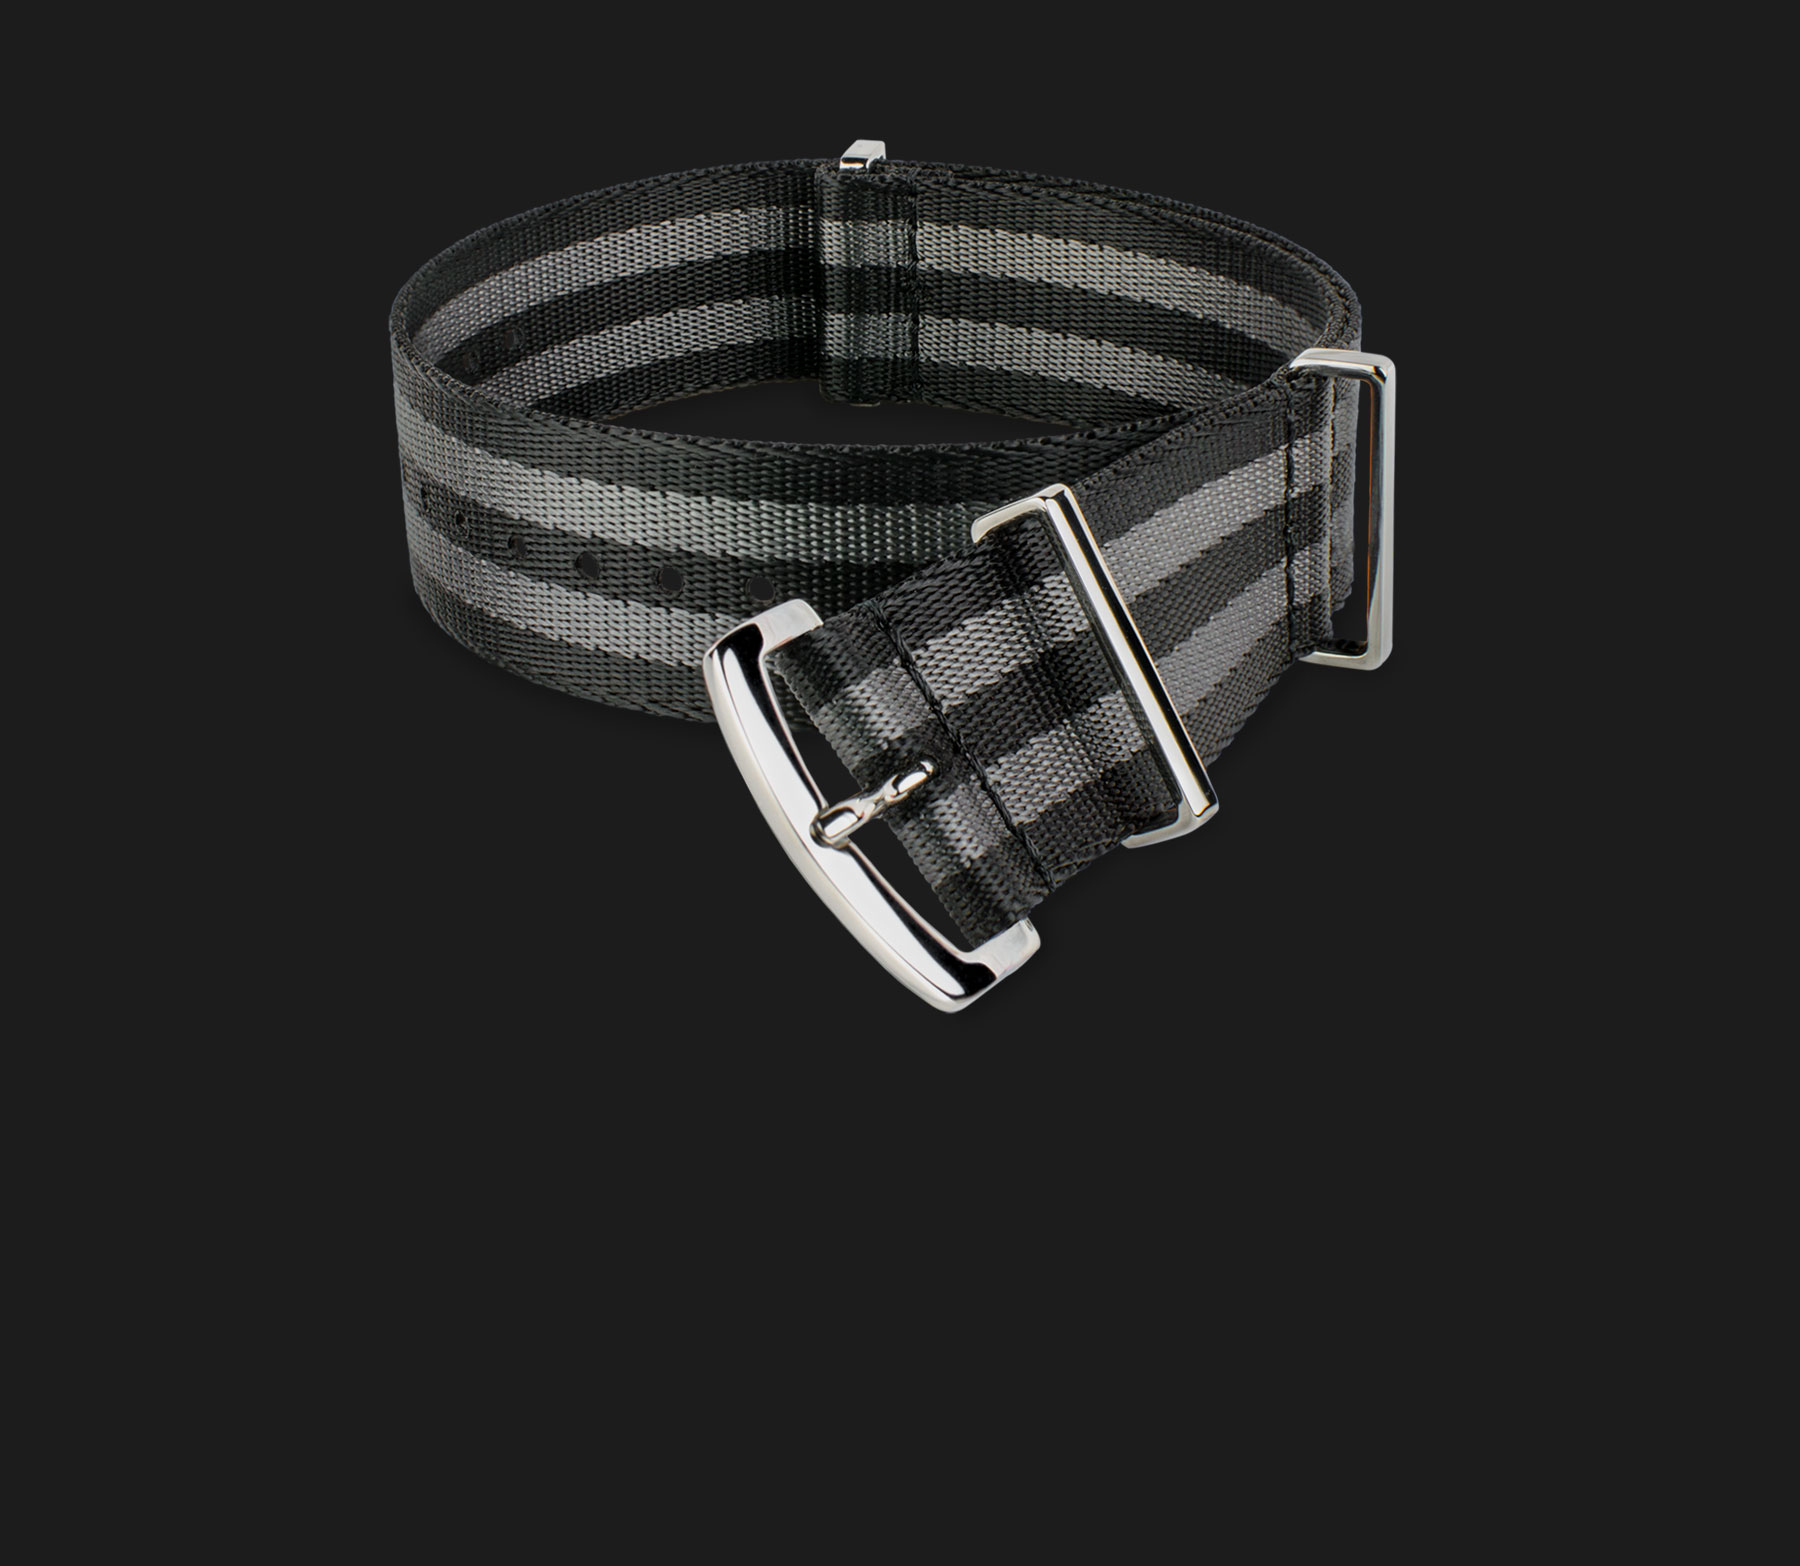 Black & Gray Striped Strap